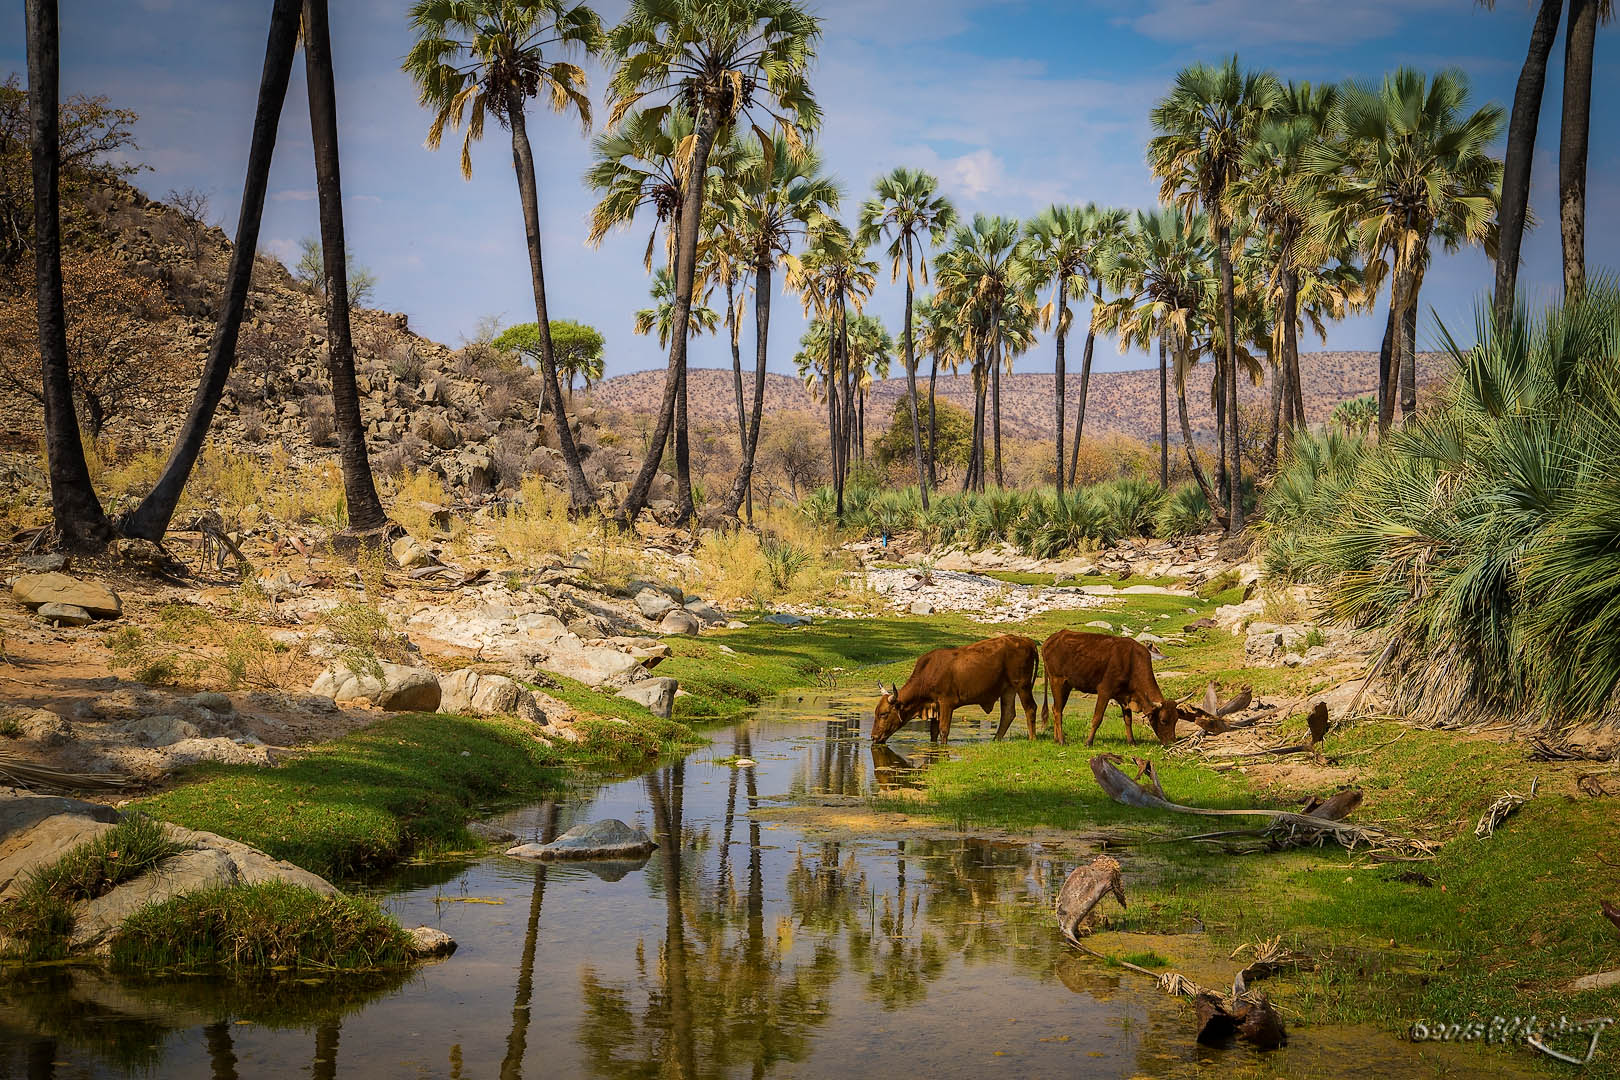 Makalani_Palms_along_Namibian_river